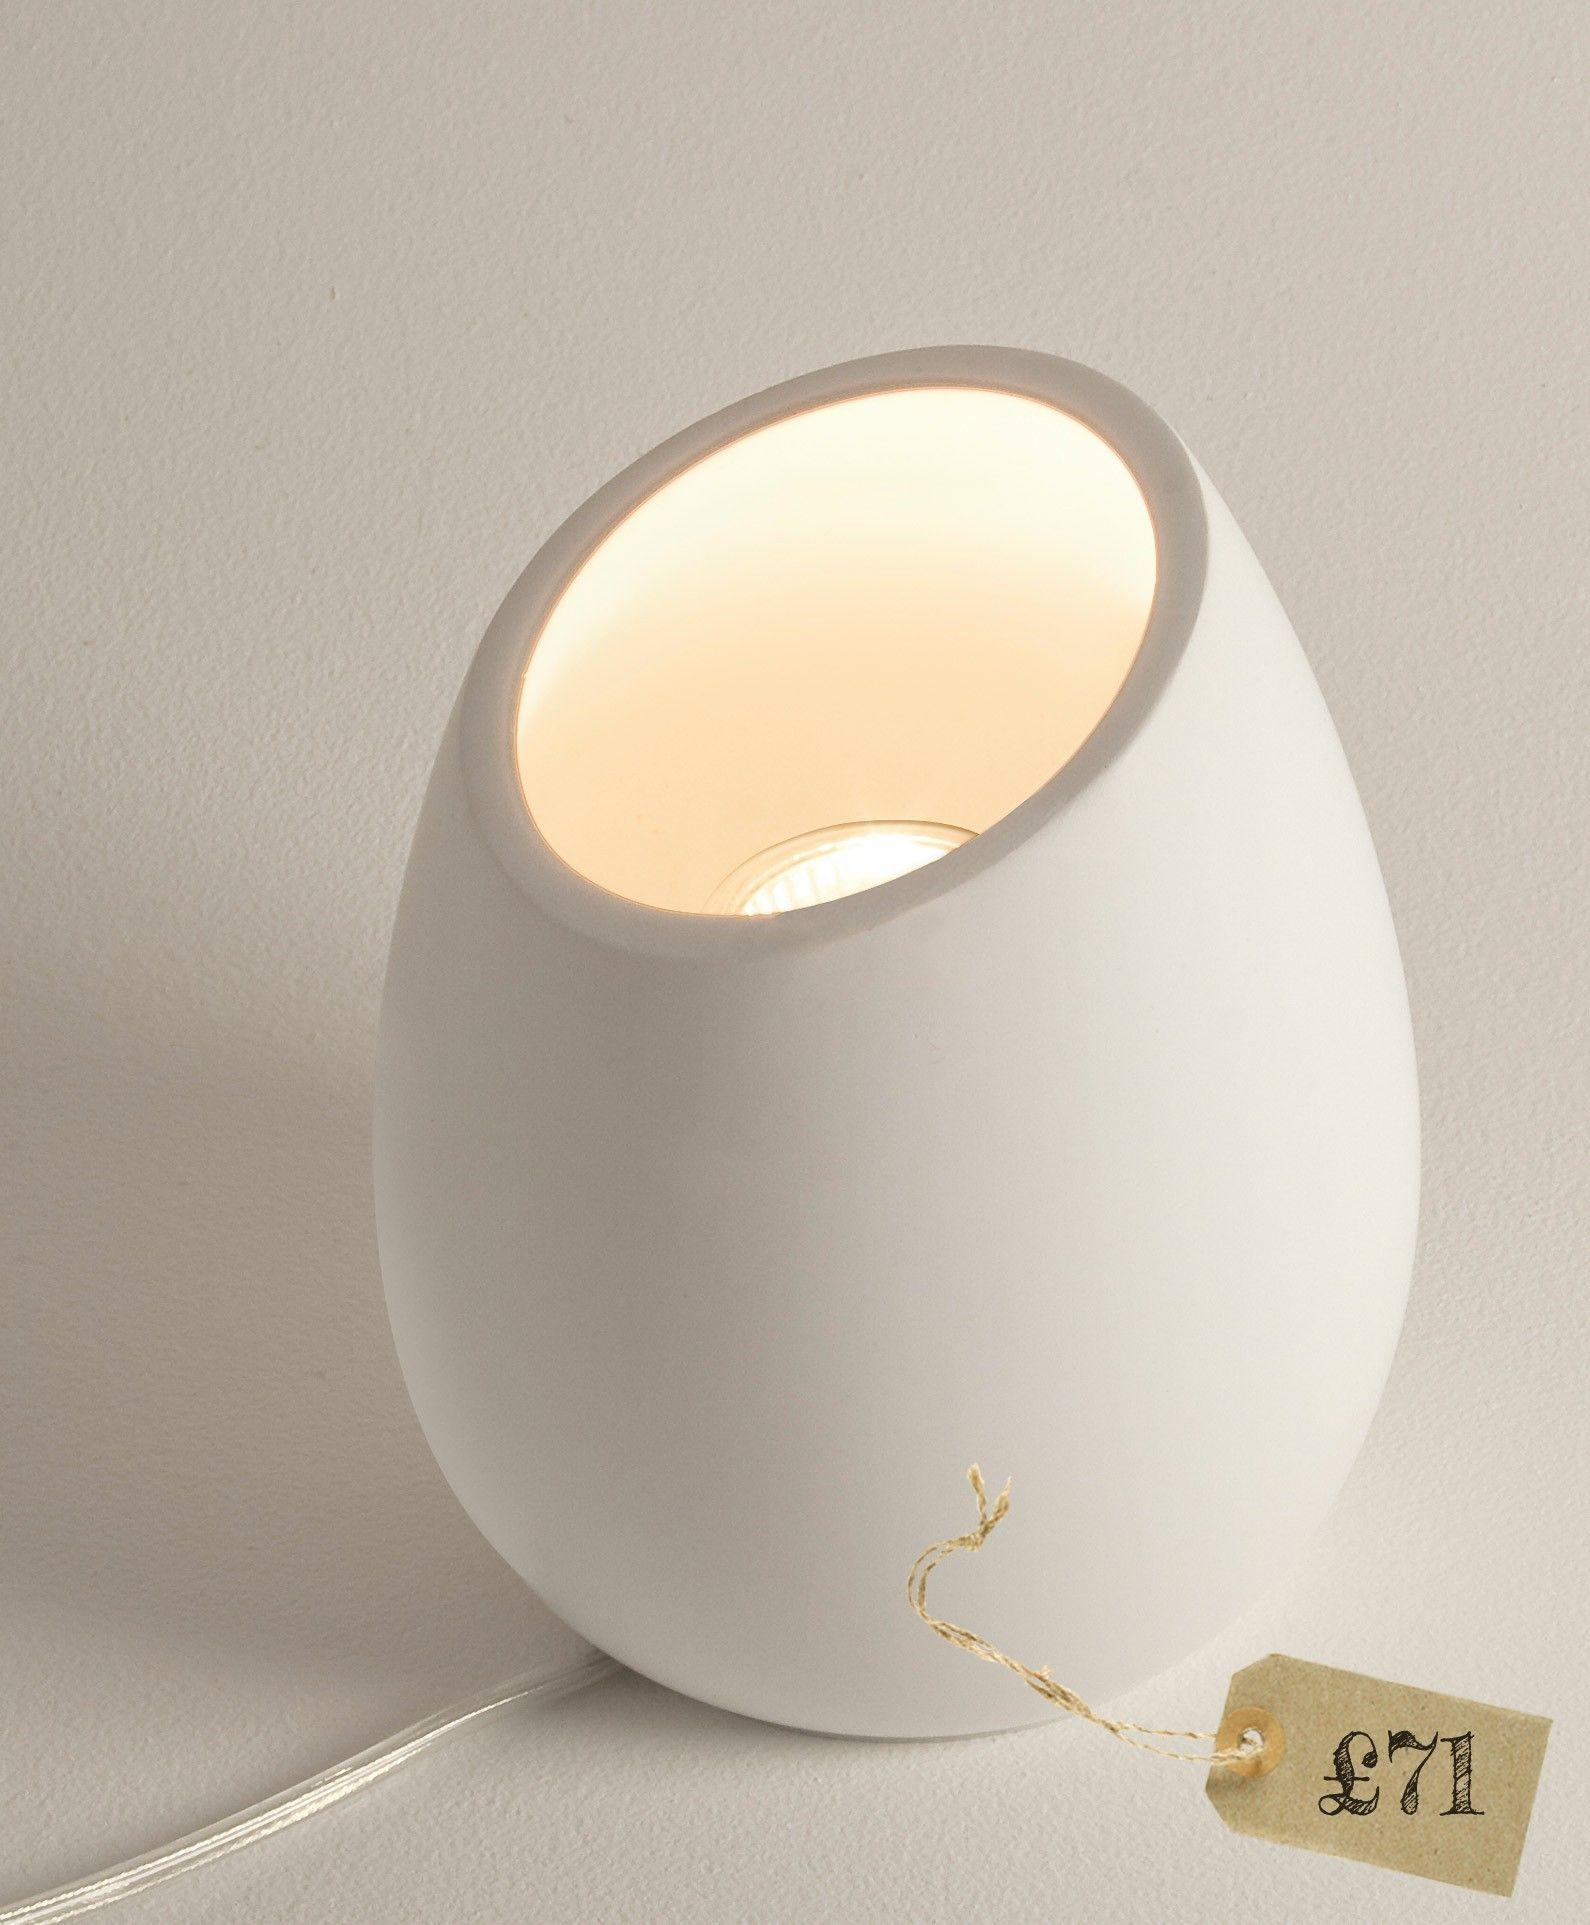 Plaster Up Lighting Floor Lamp